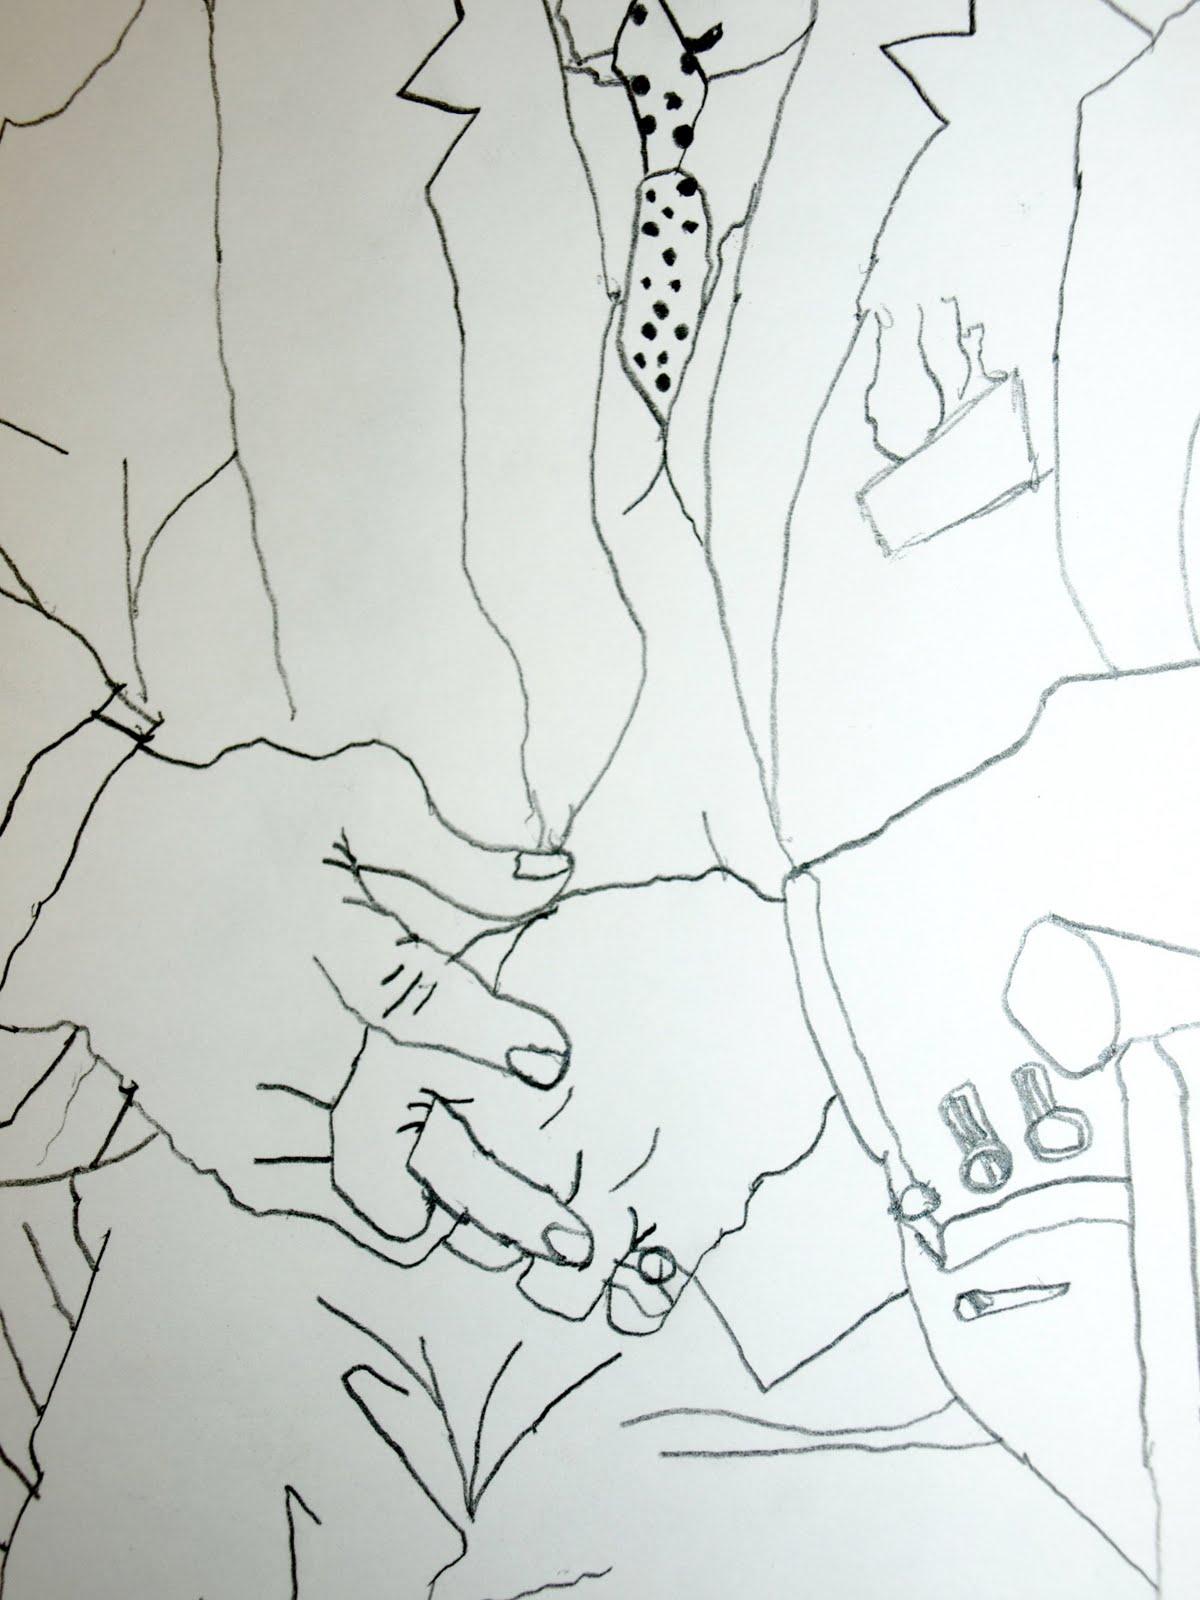 Line Drawing Upside Down : Art instructor danica papali upside down line drawings